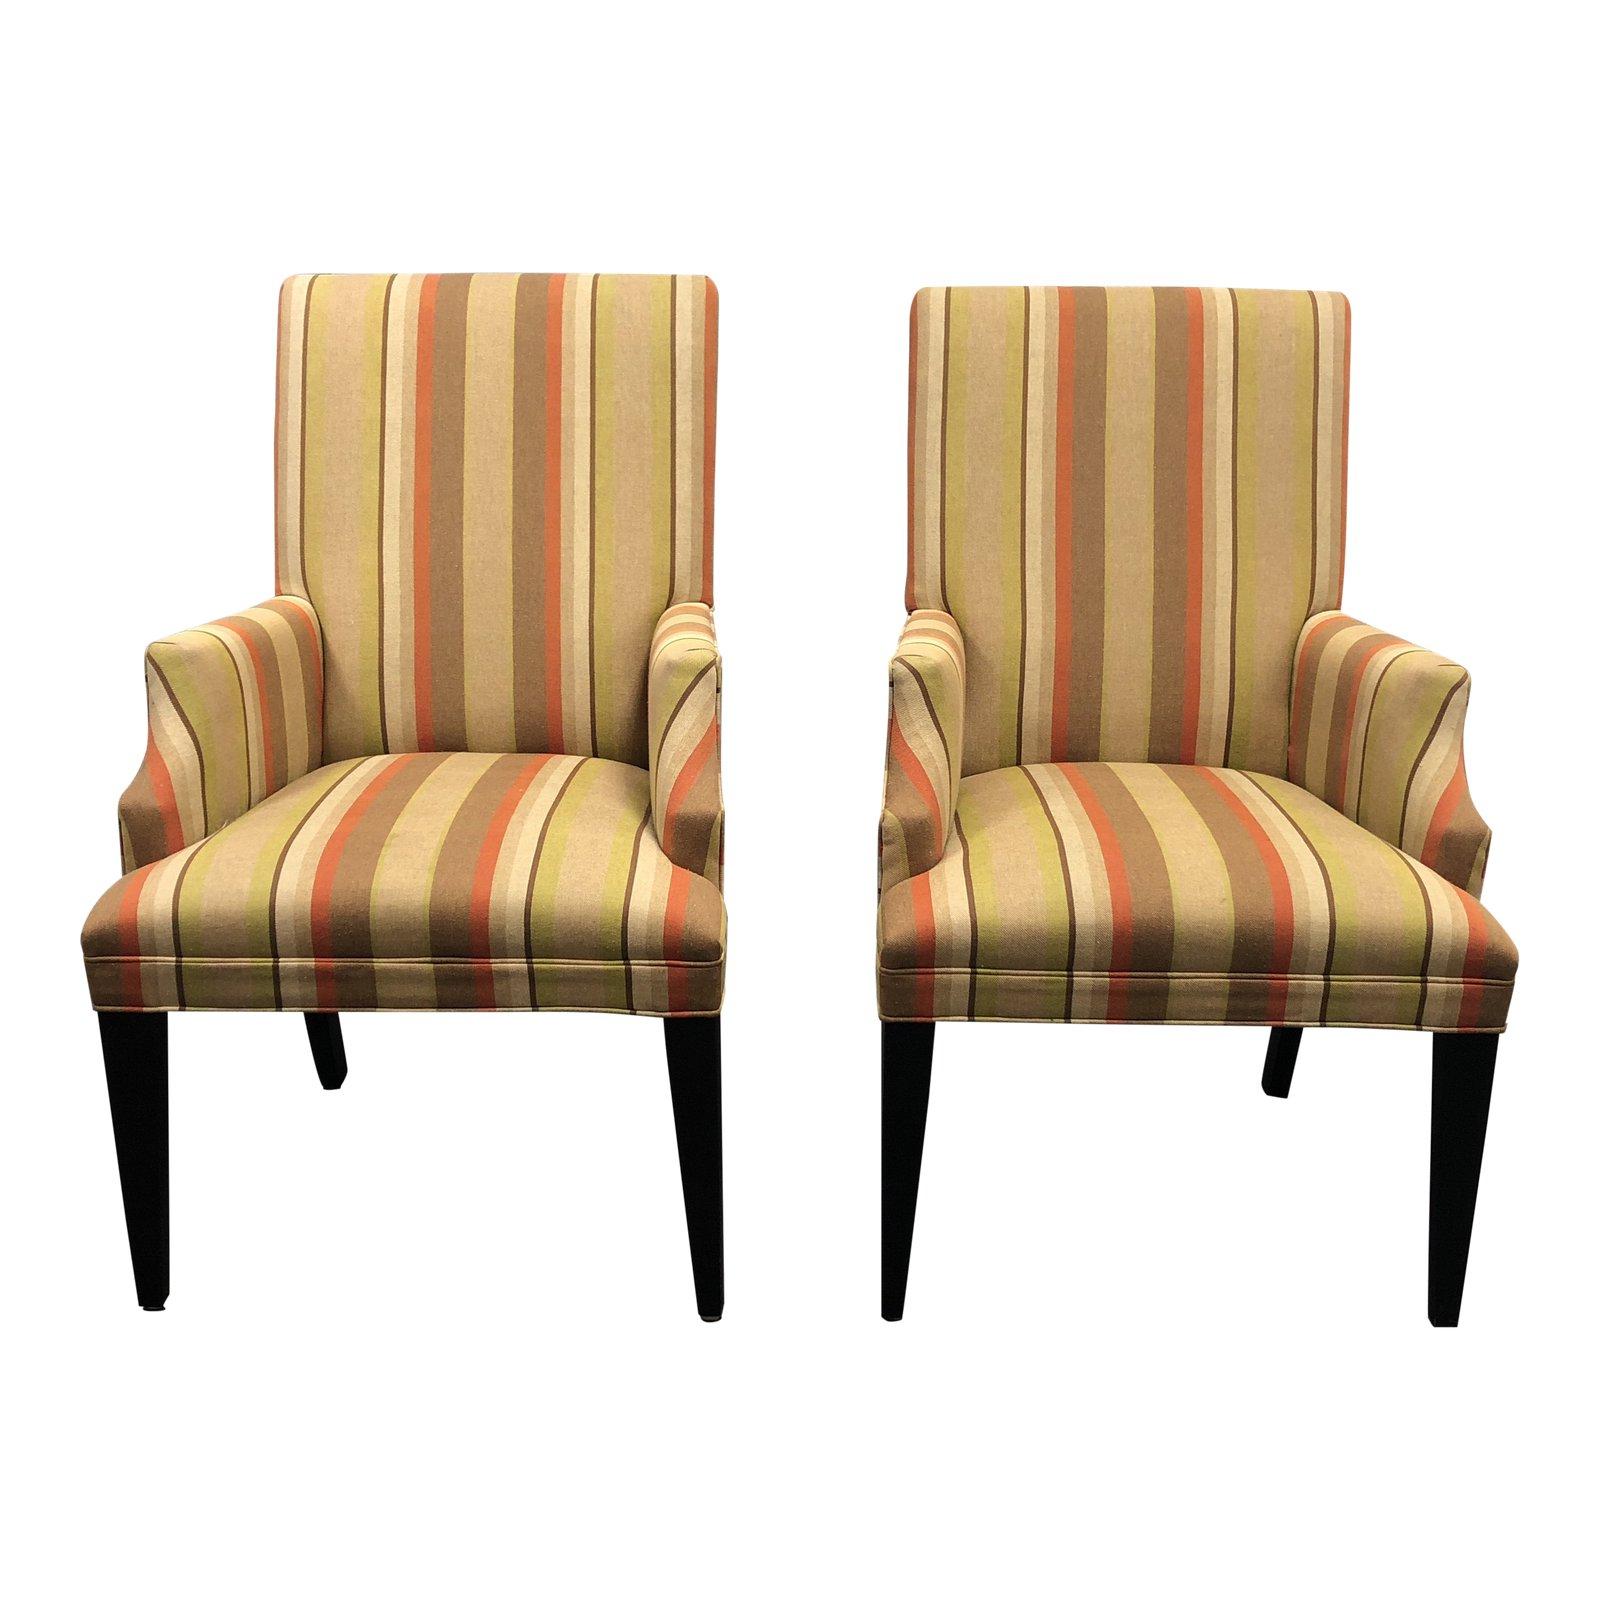 Mitchell Arm Sofa Chairs